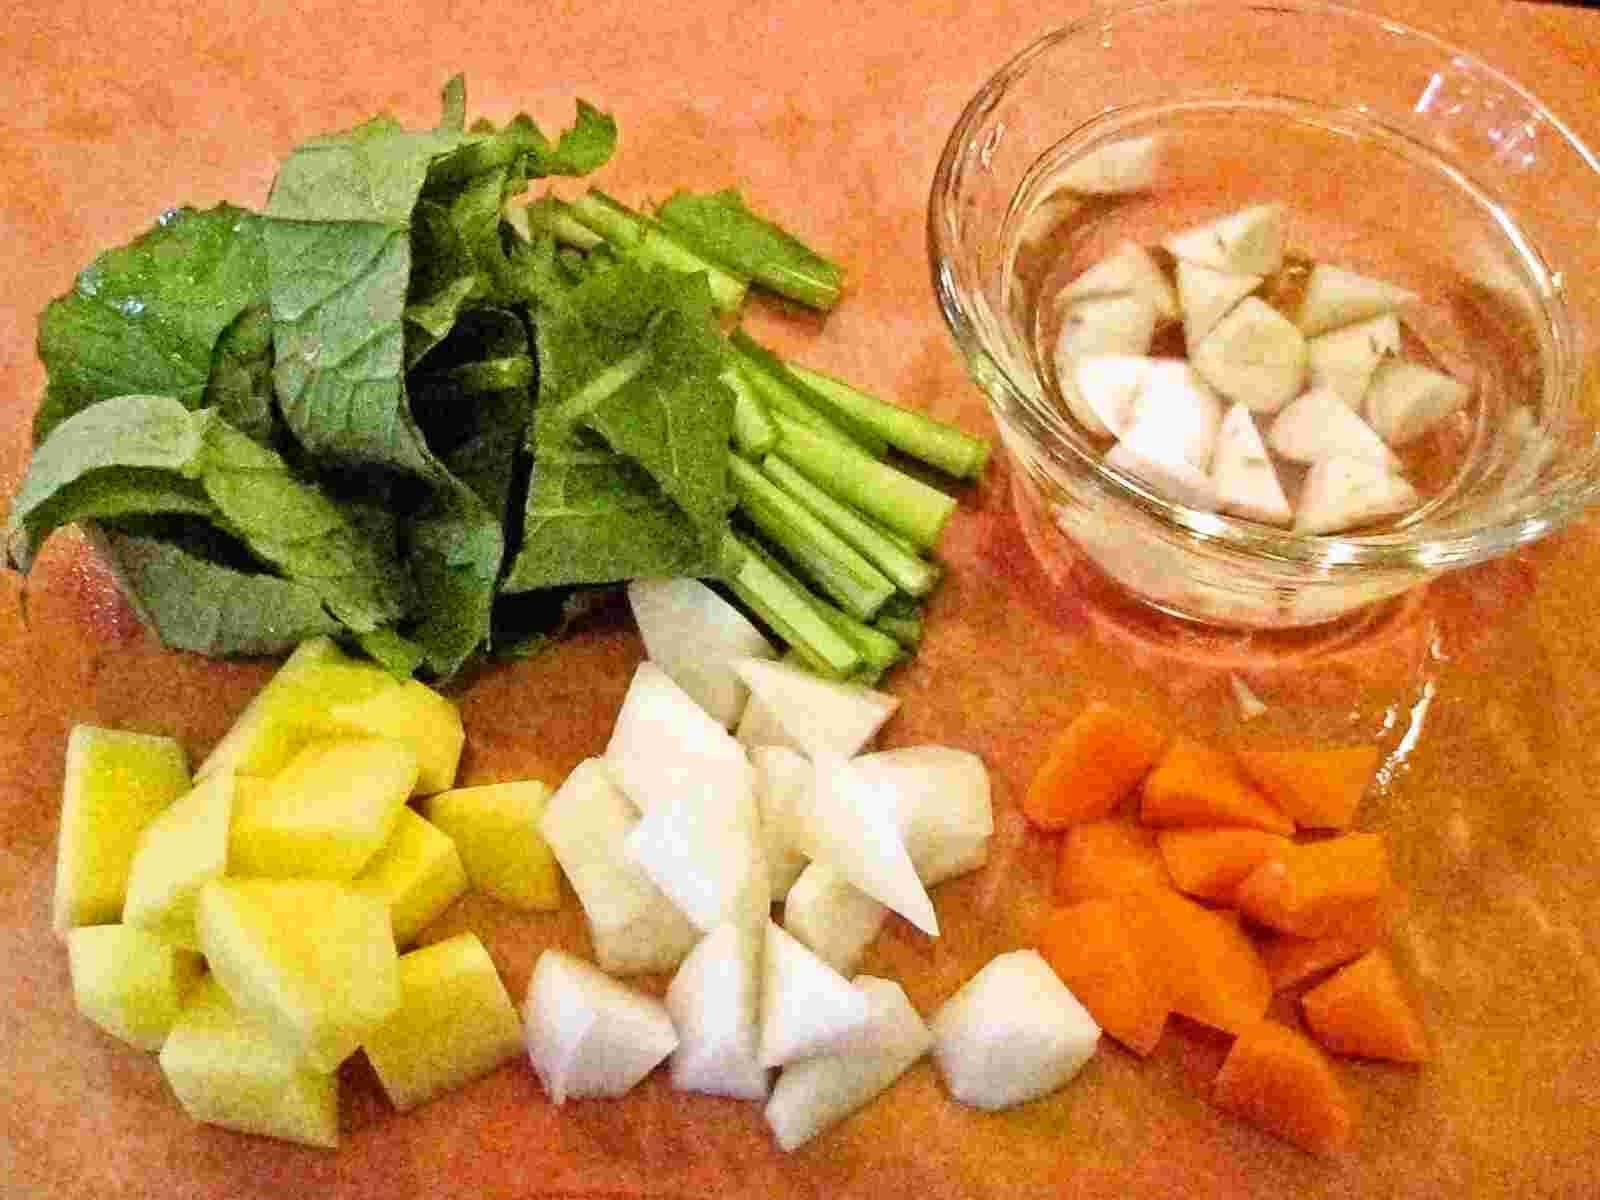 Recipes for Tom Konsai no misoshiru miso soup with root